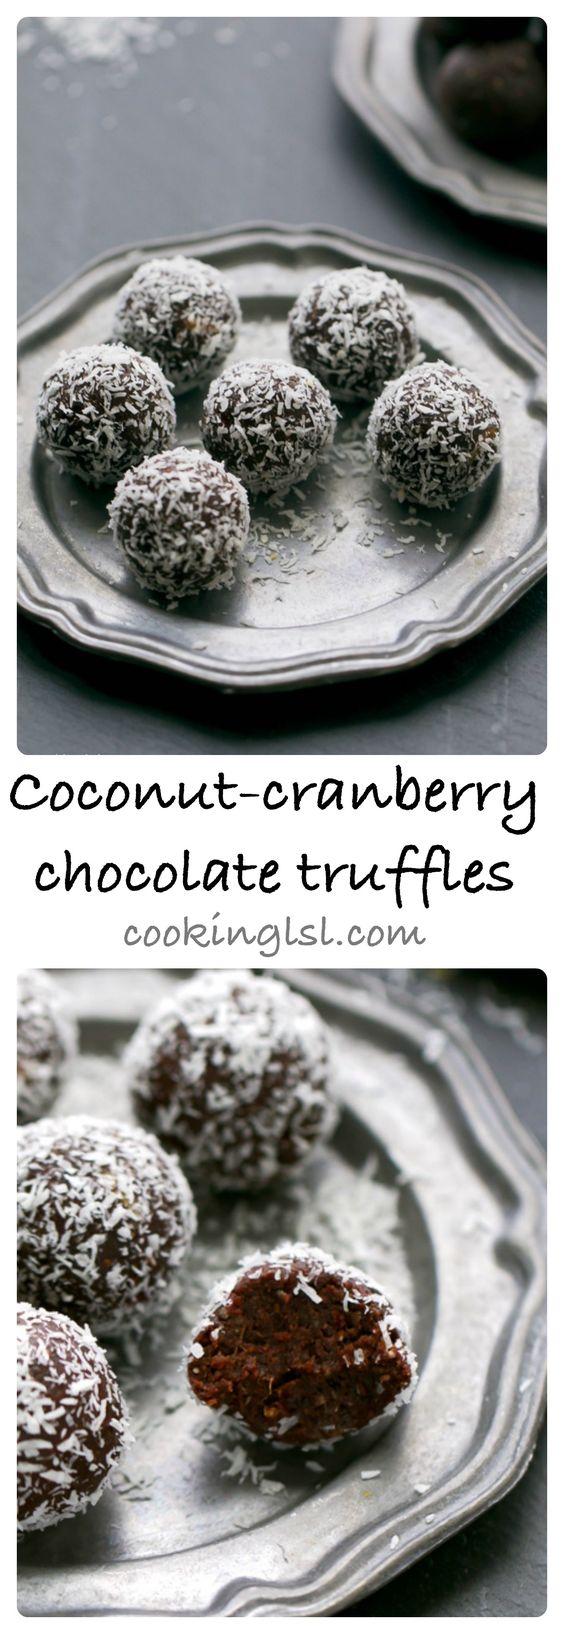 raw-coconut-cranberry-chocolate-truffles-recipe